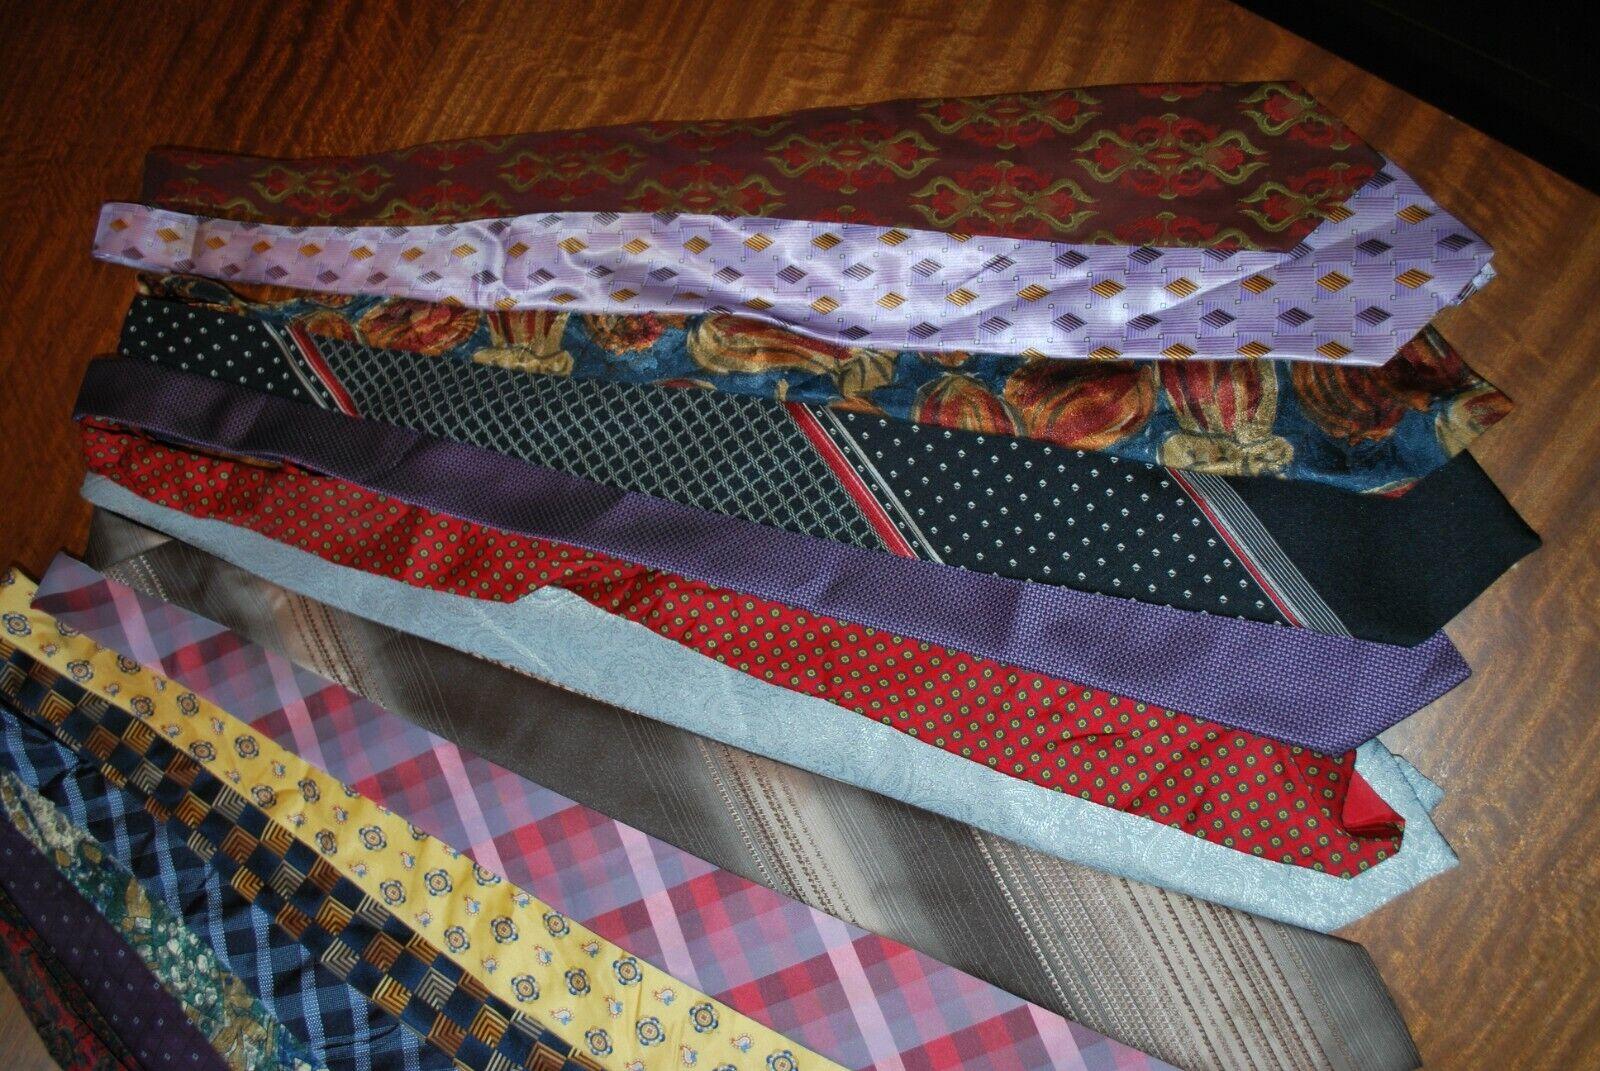 15 x various coloured patterned Tie's job lot bulk buy 14 vintage